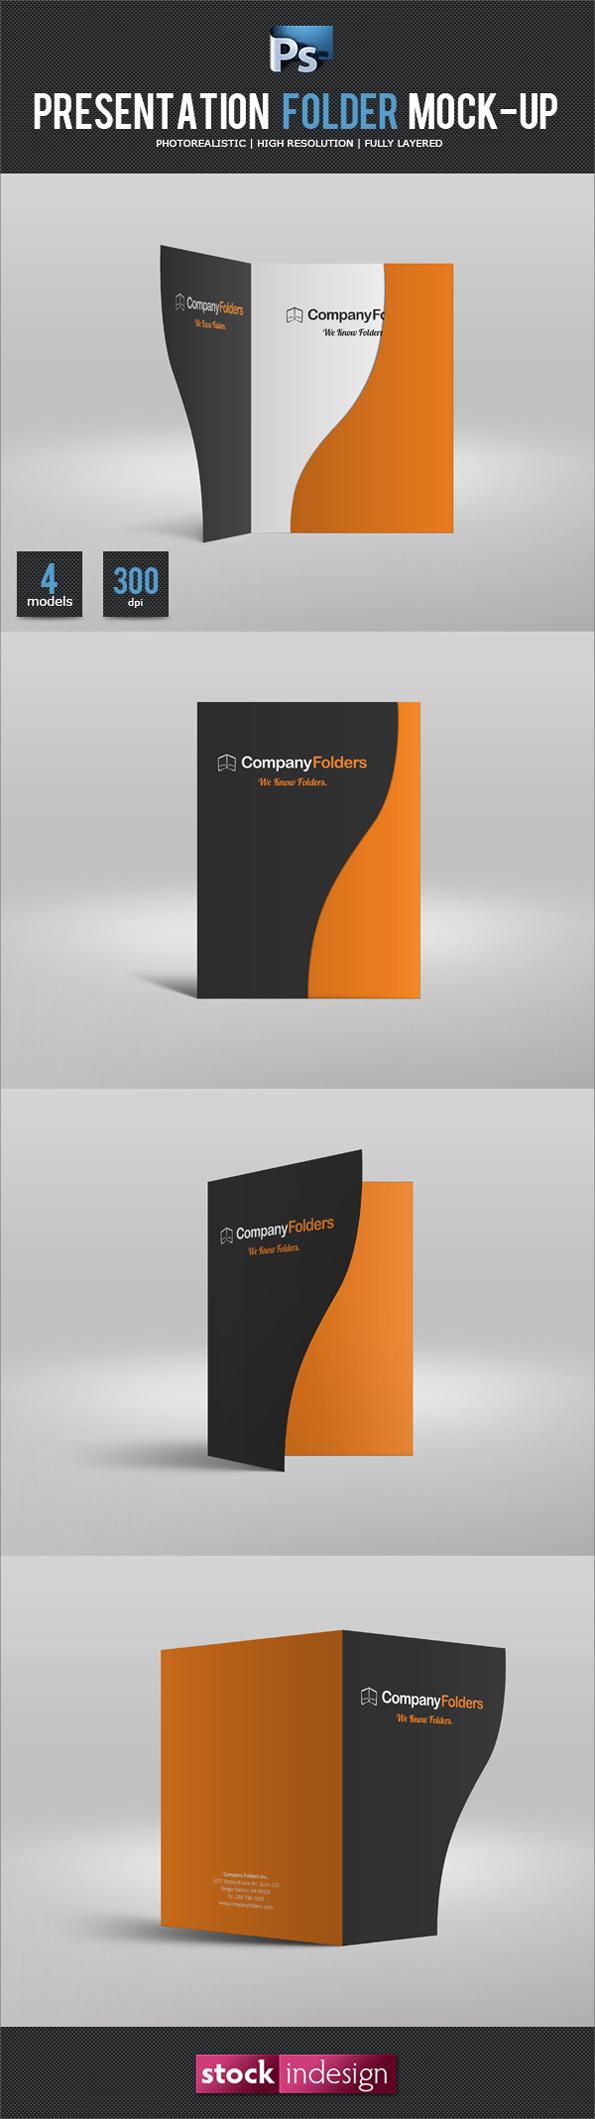 FREE Folder Mock-Up